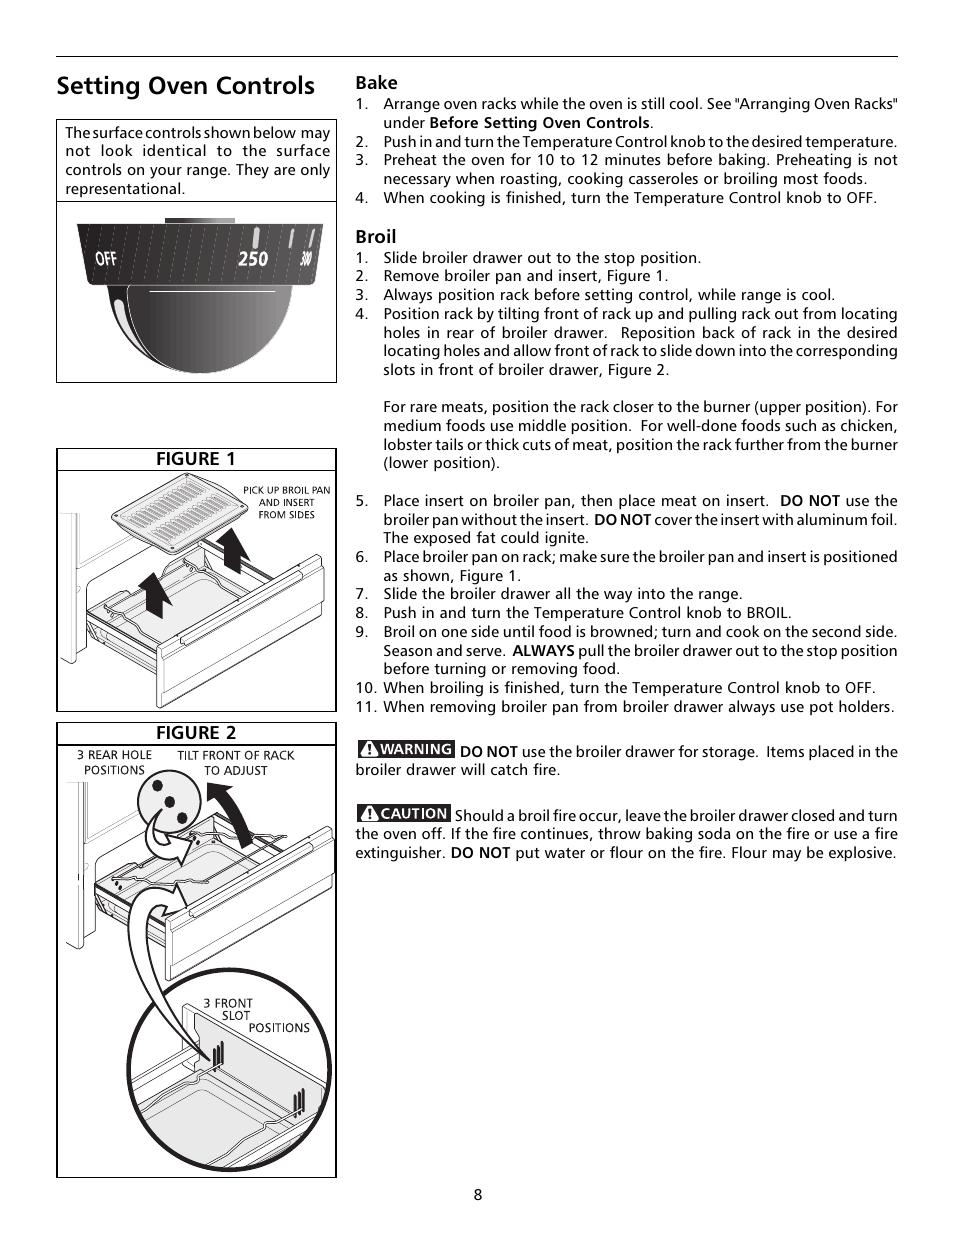 Setting oven controls | Tappan Millennia 316000189 User